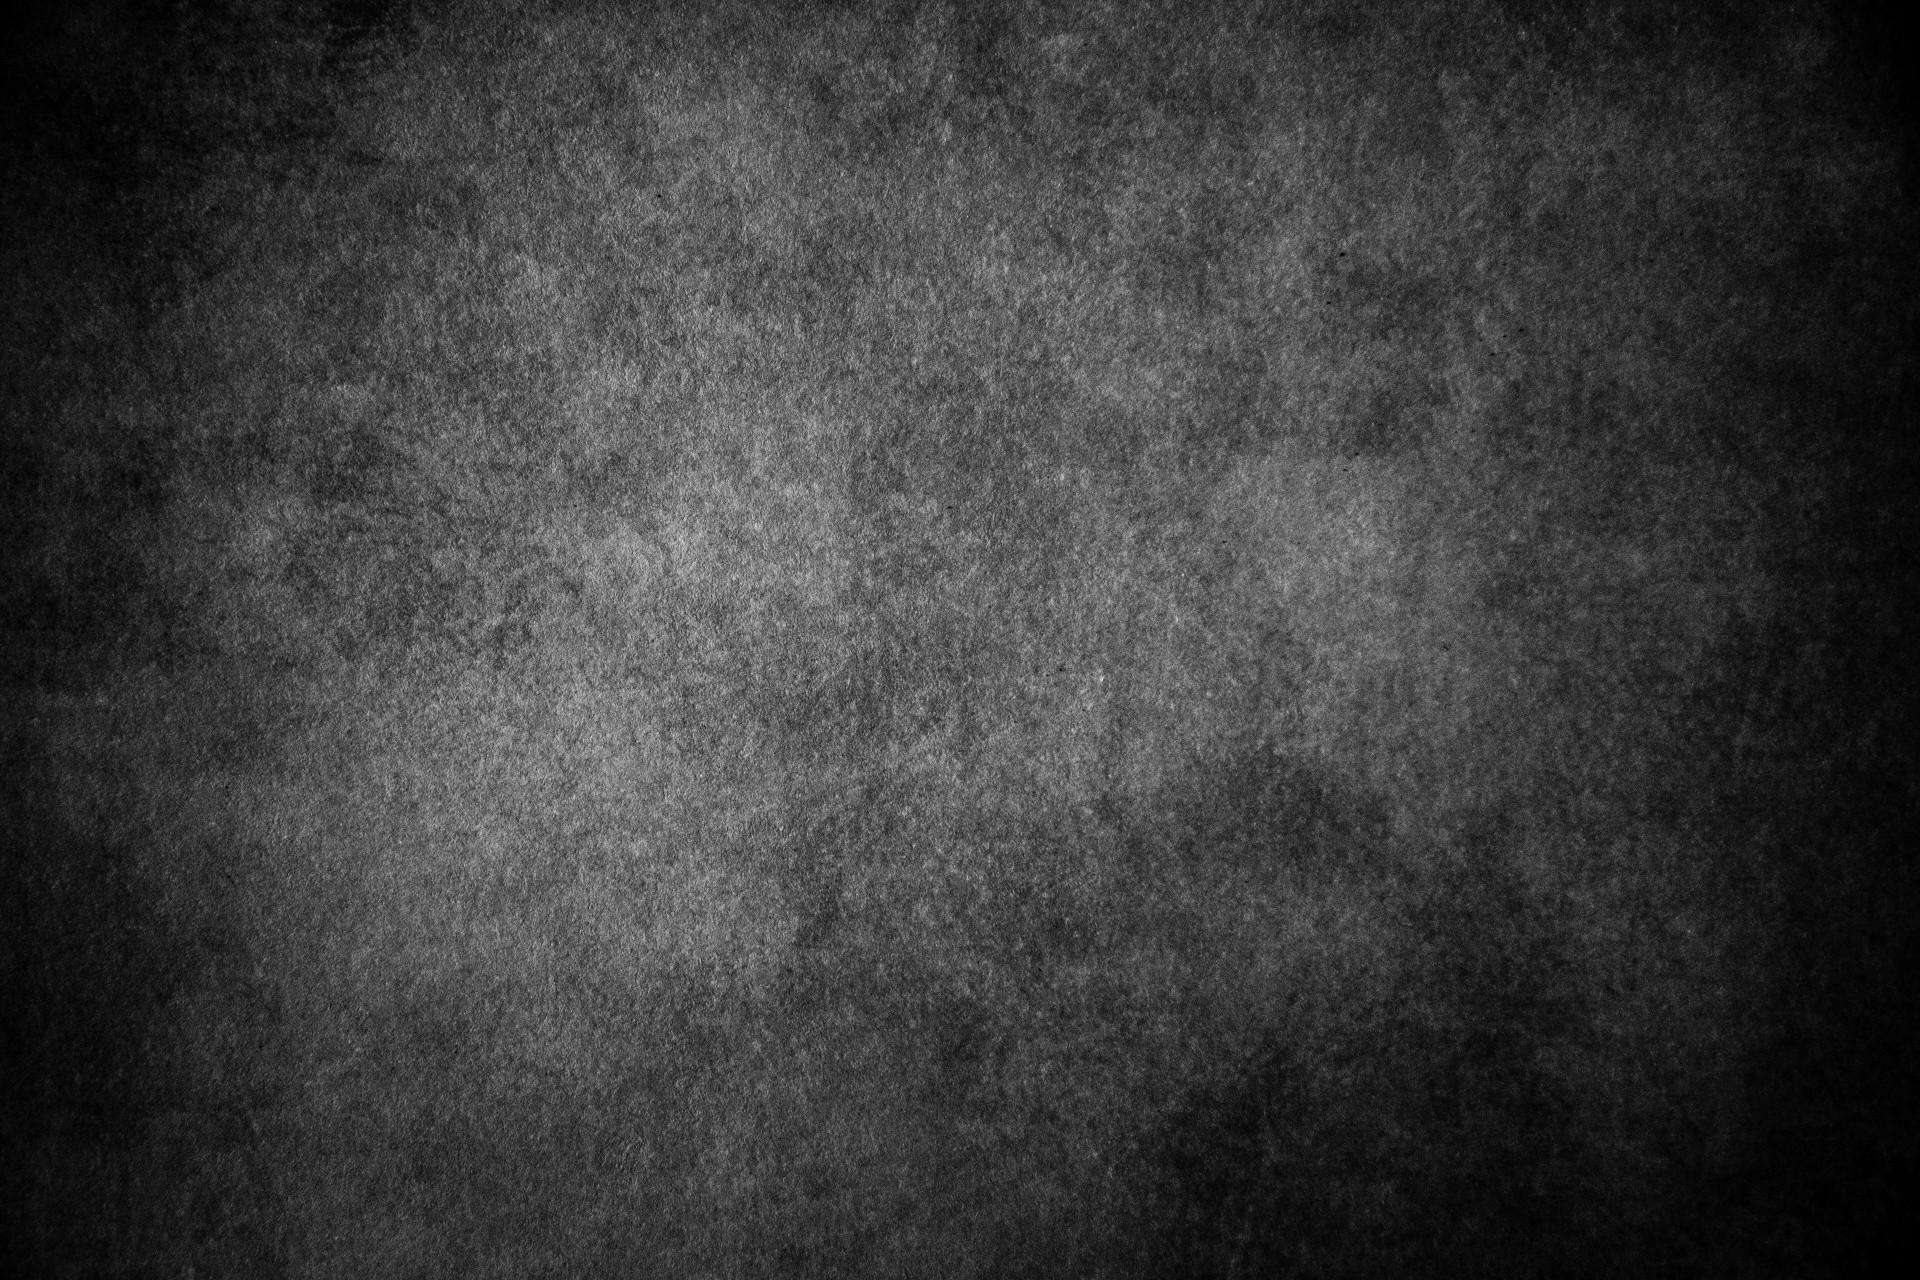 1920x1200 Grunge Wallpaper 48 Wallpapers